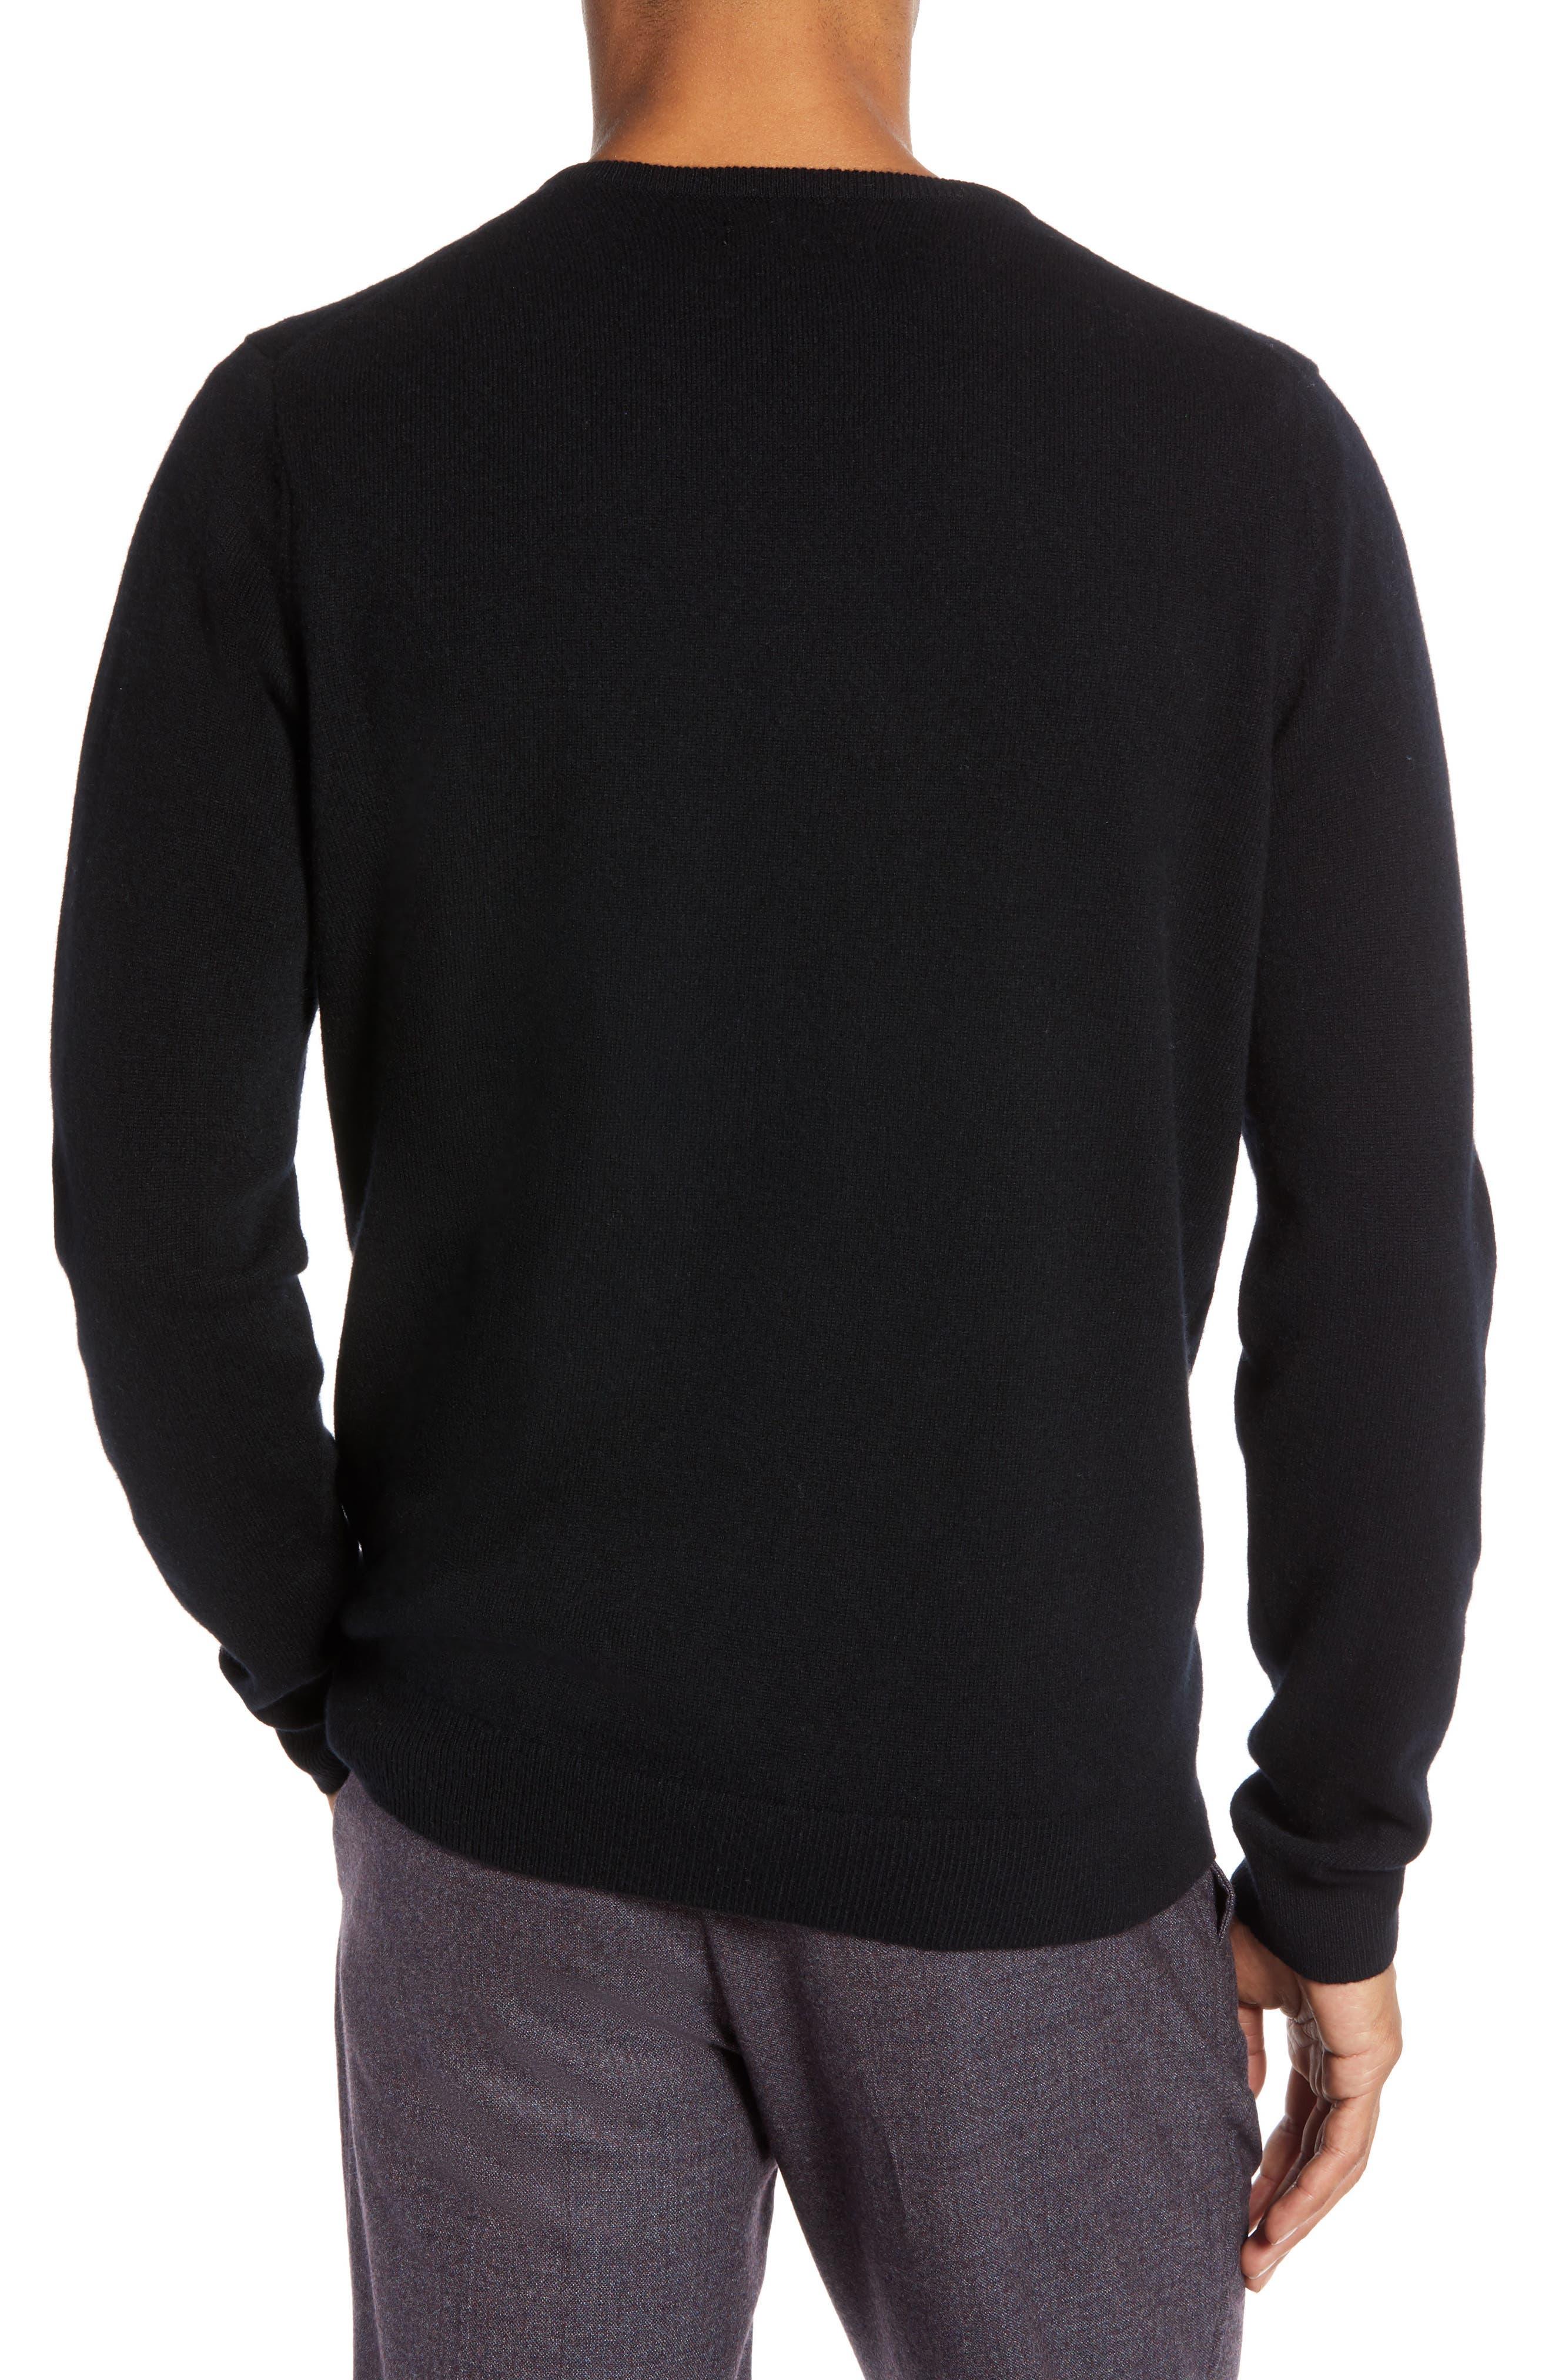 Regular Fit Wool & Cashmere Sweater,                             Alternate thumbnail 2, color,                             BLACK CAVIAR